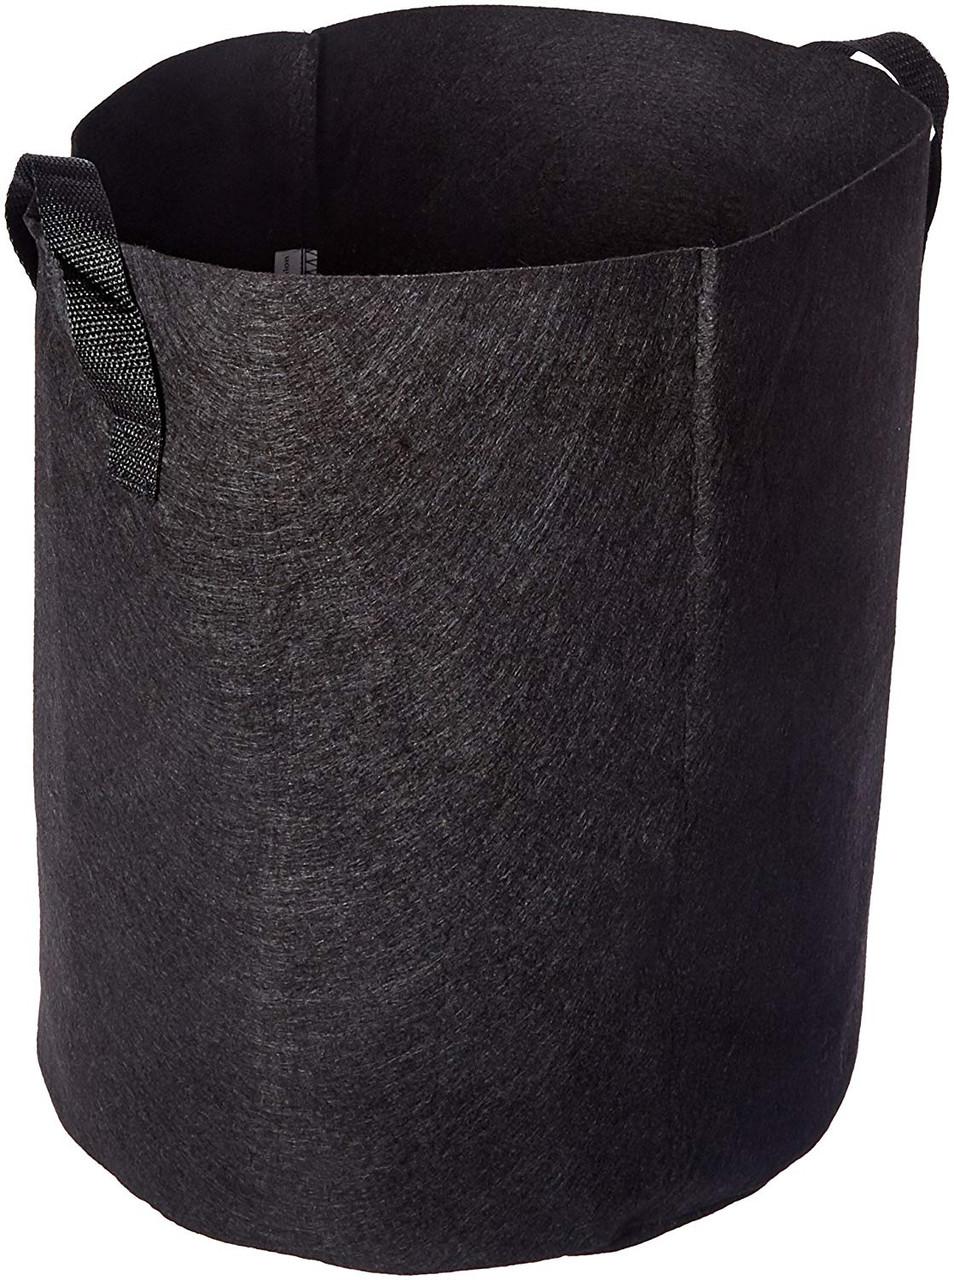 Viagrow Fabric Pot w/ Handles Black 7gal 5pk